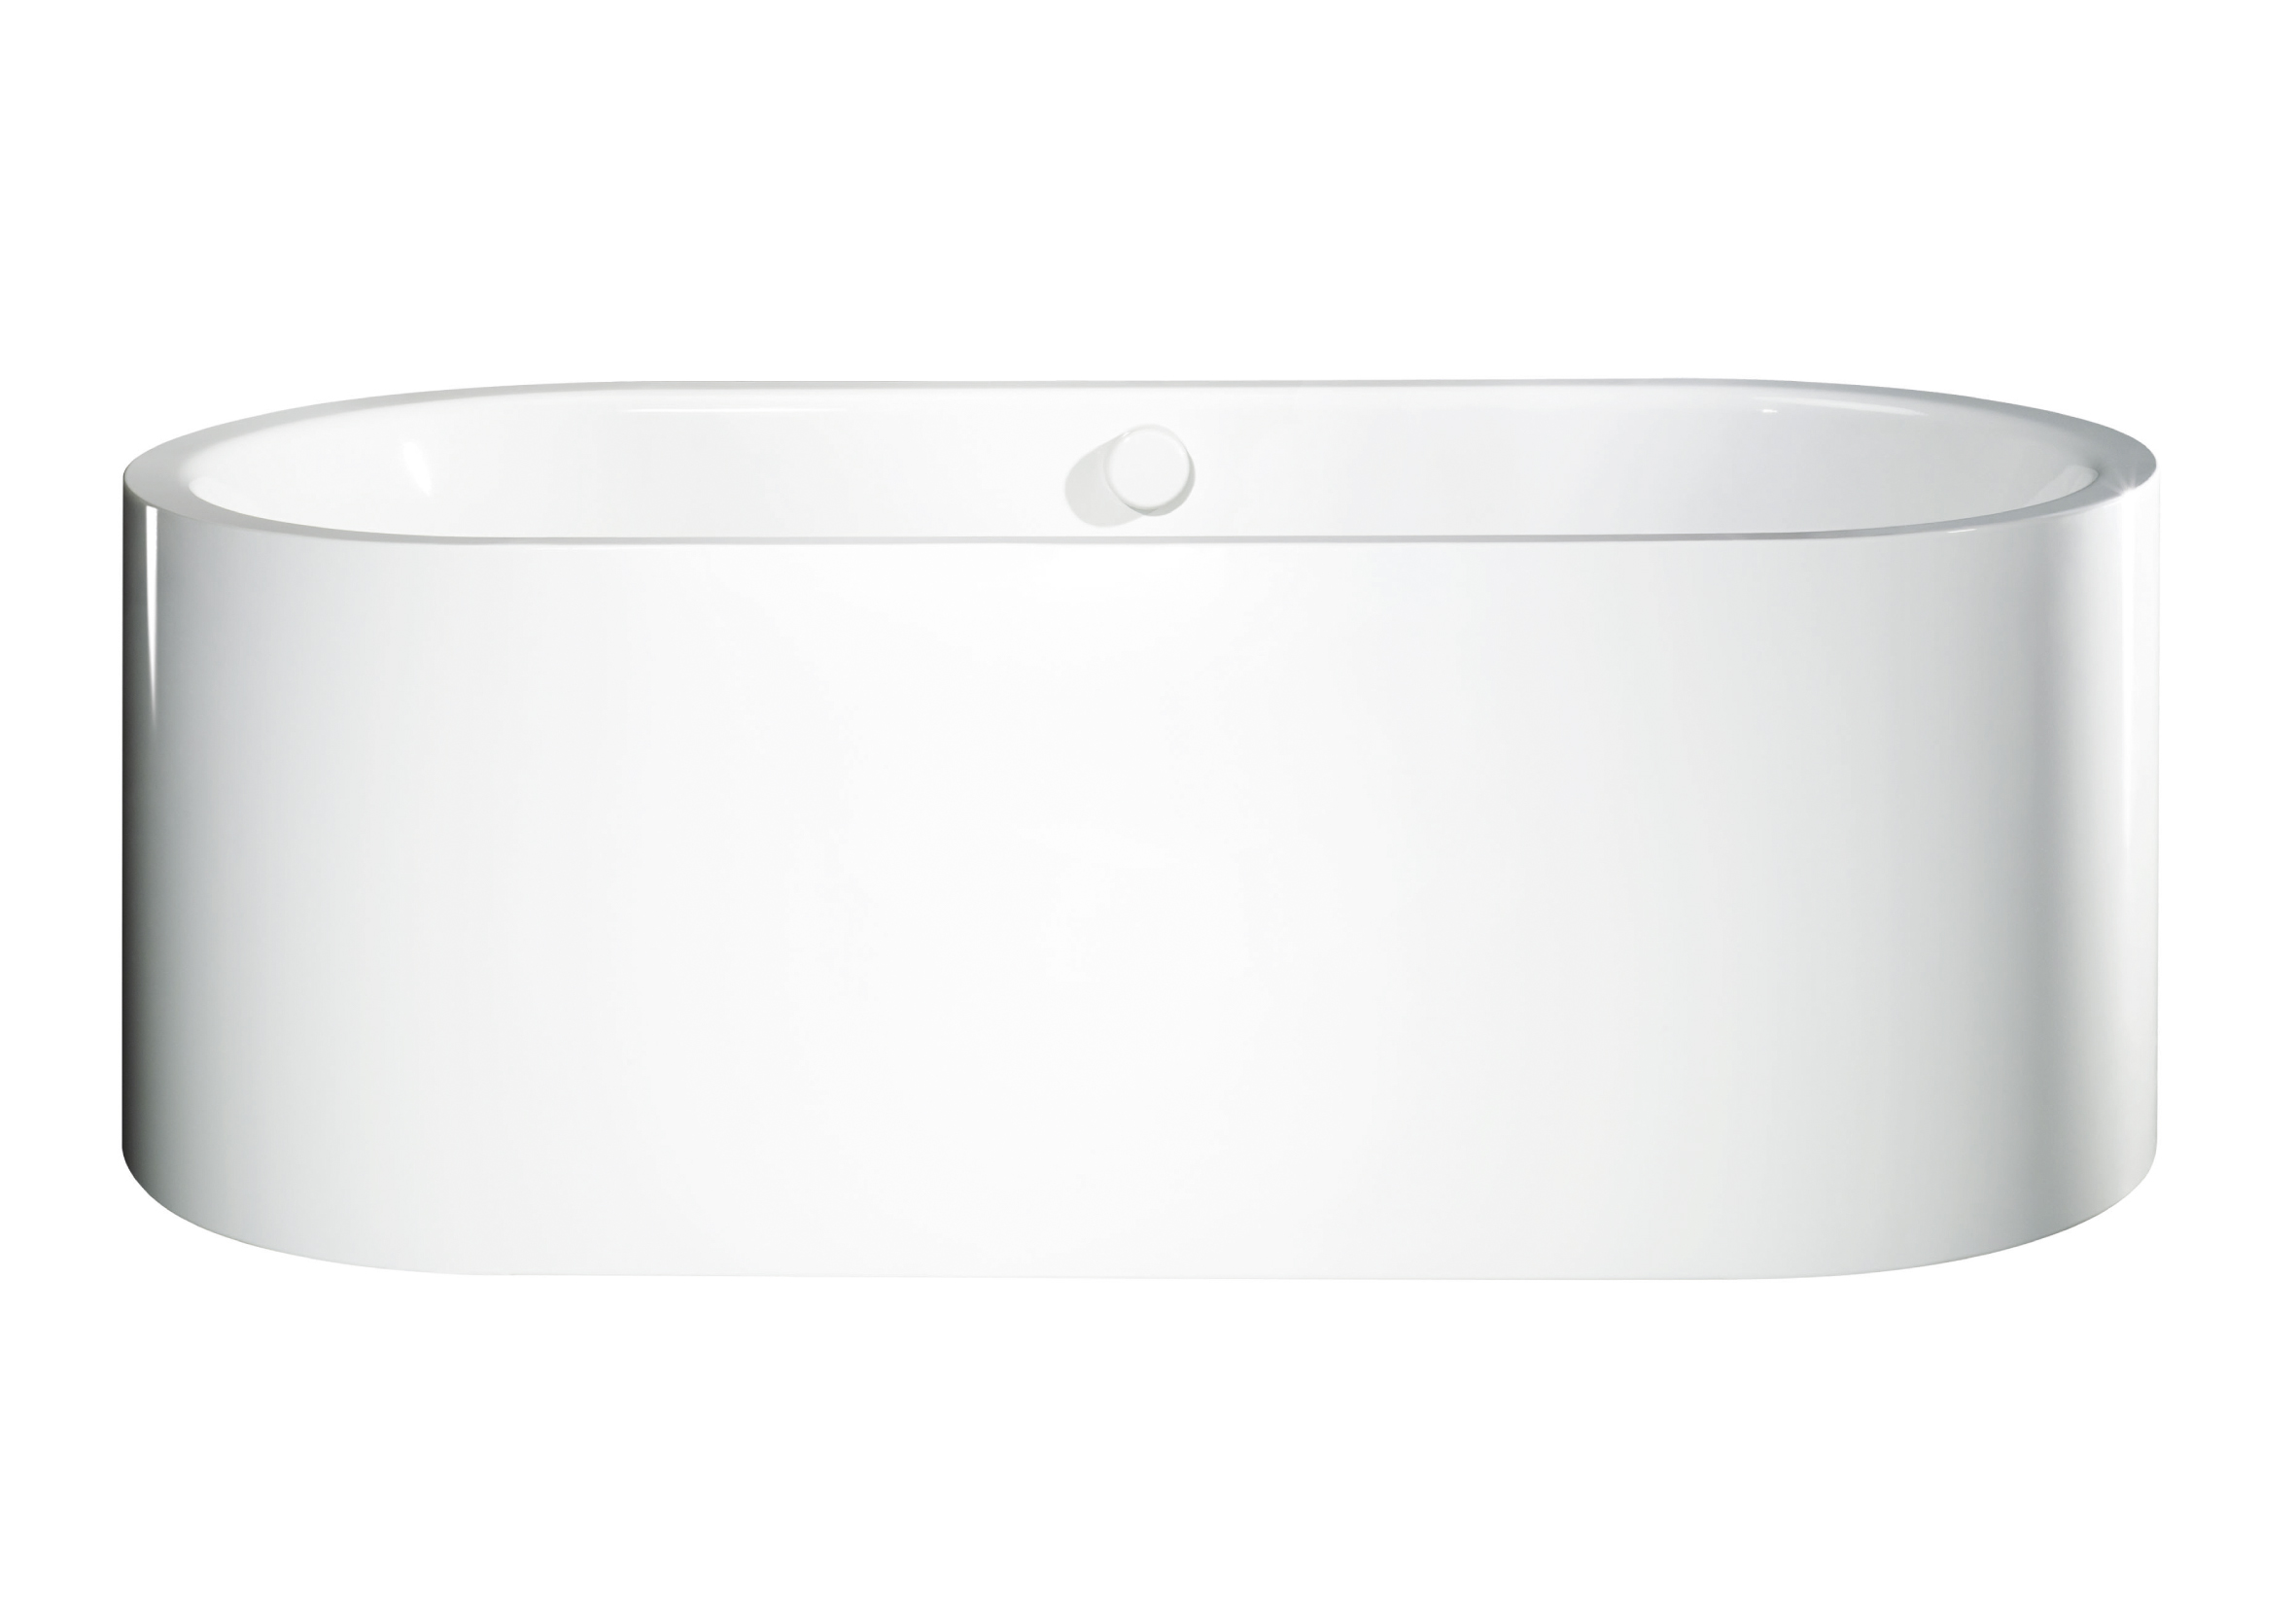 kaldewei kaldewei pr sentiert neues premium segment meisterst cke iconic bathroom solutions. Black Bedroom Furniture Sets. Home Design Ideas